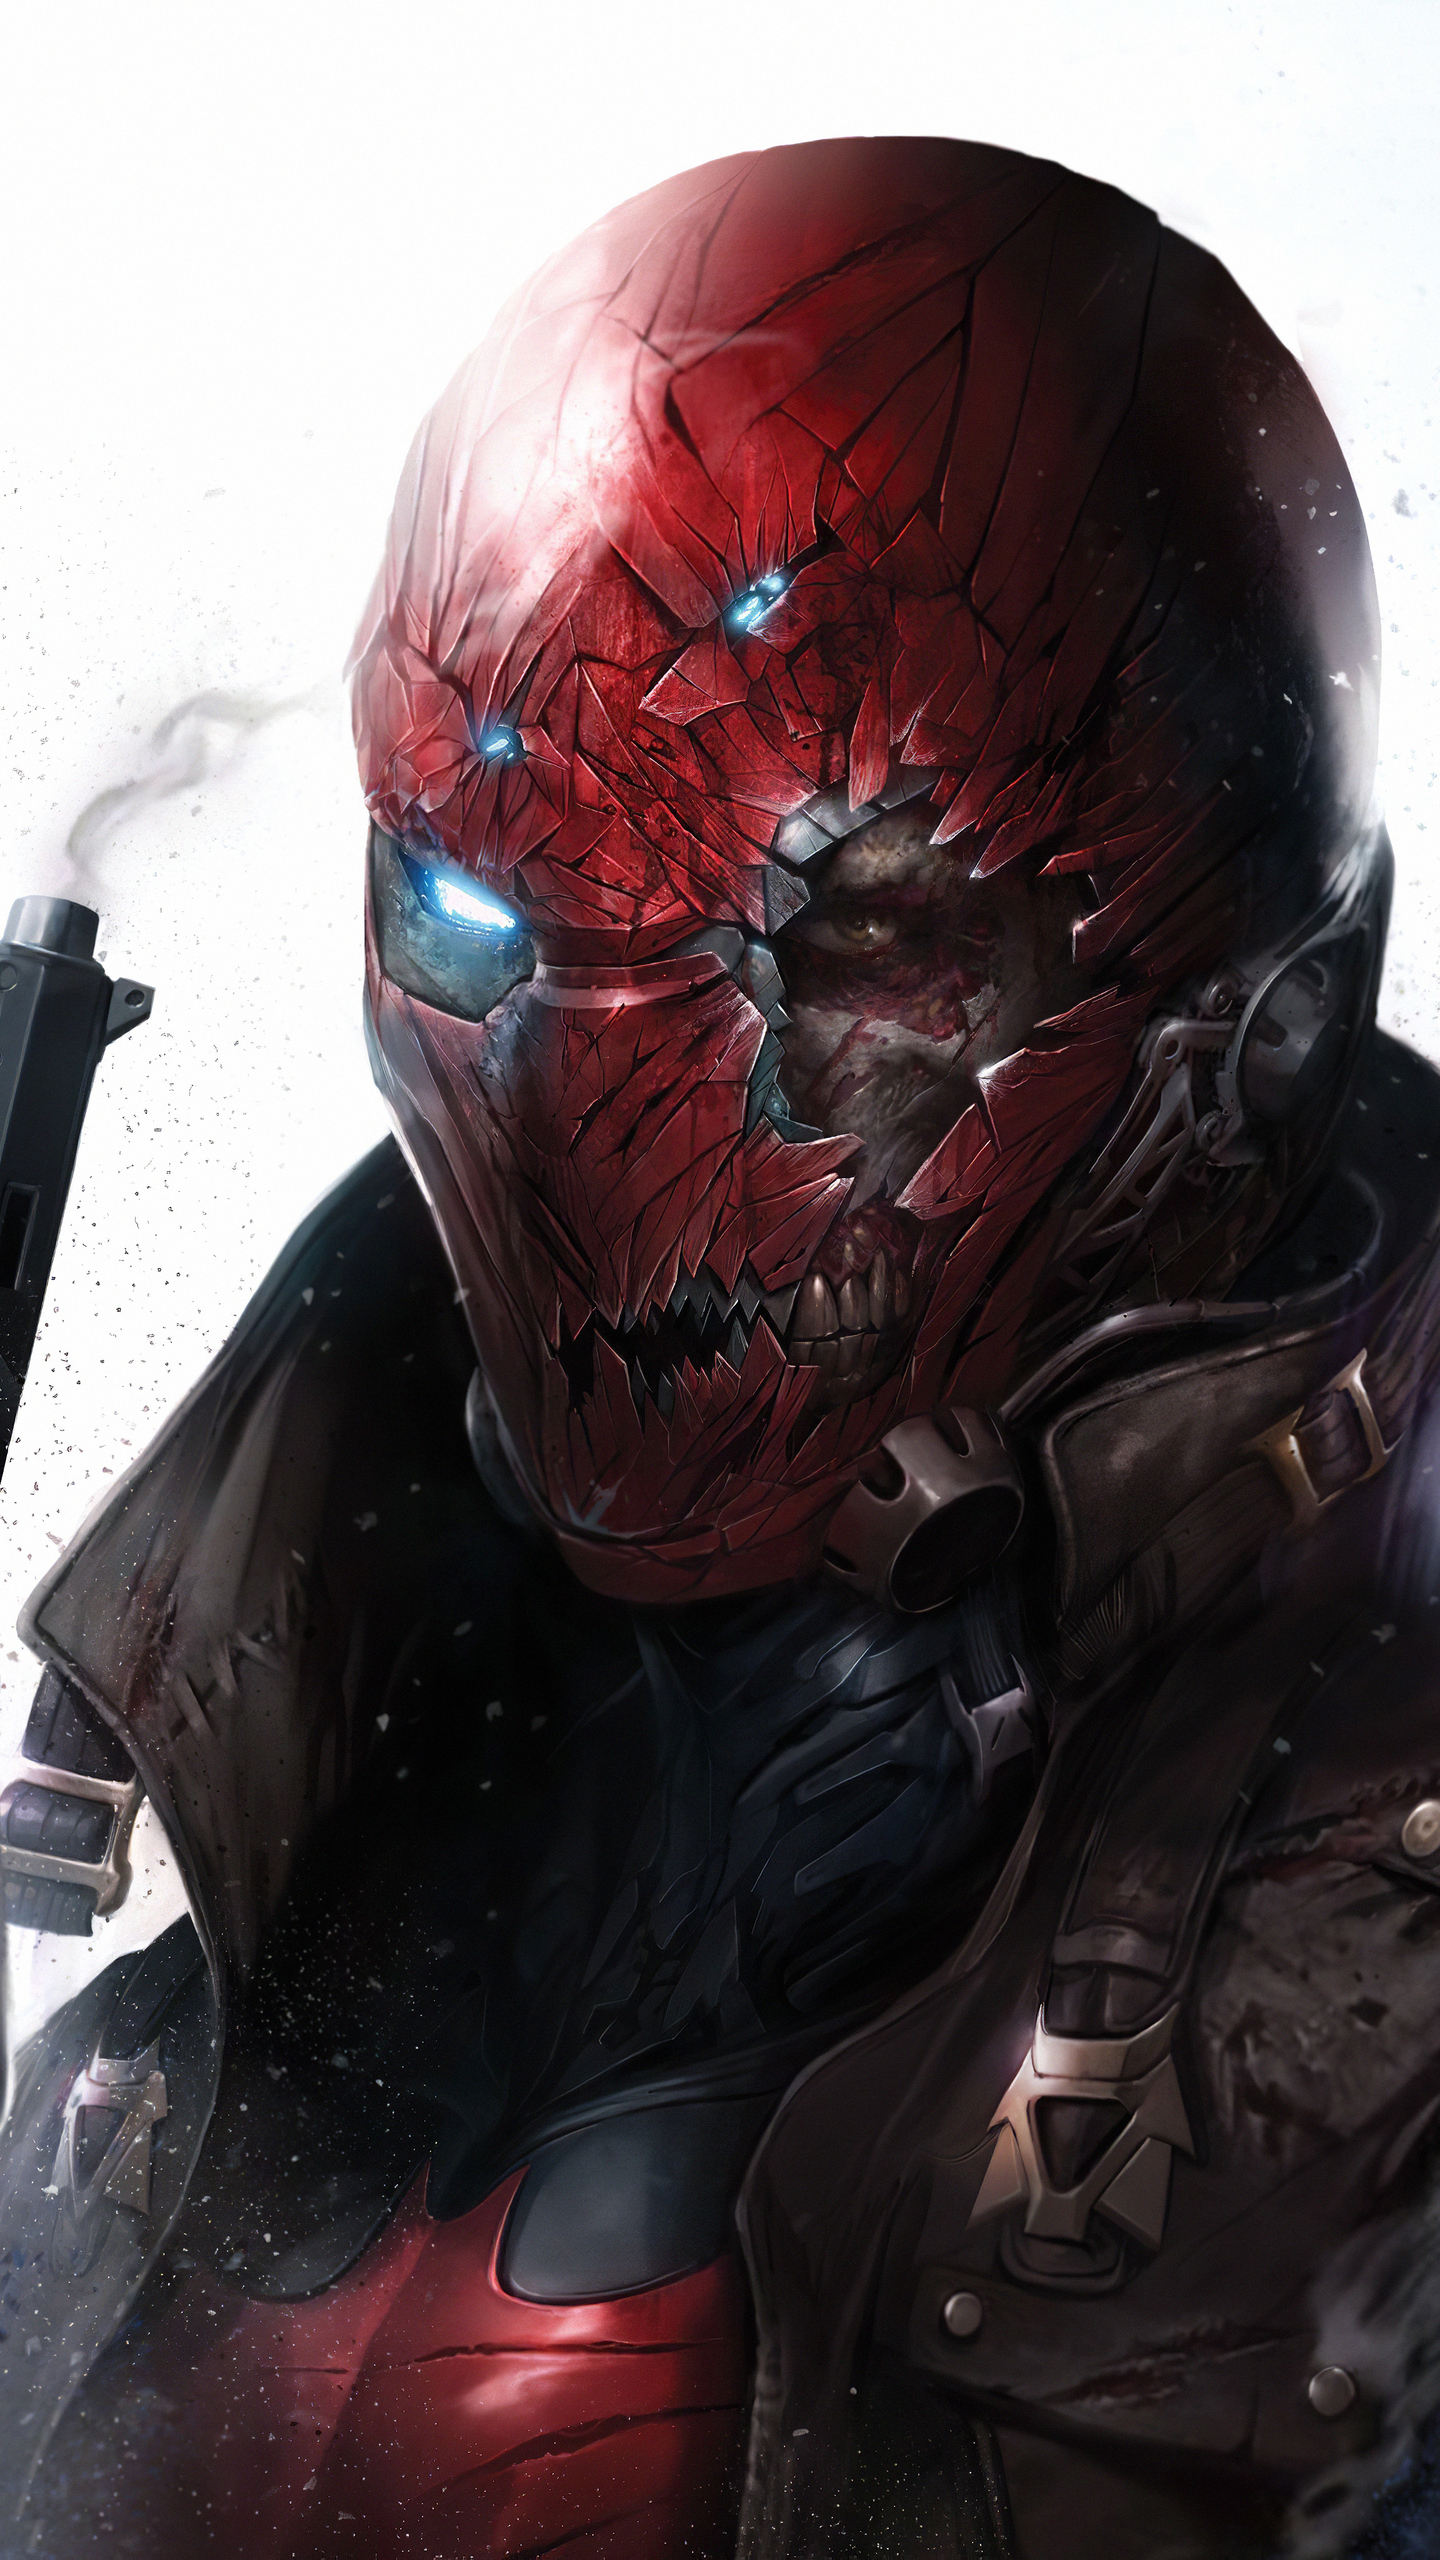 red-hood-mask-7j.jpg